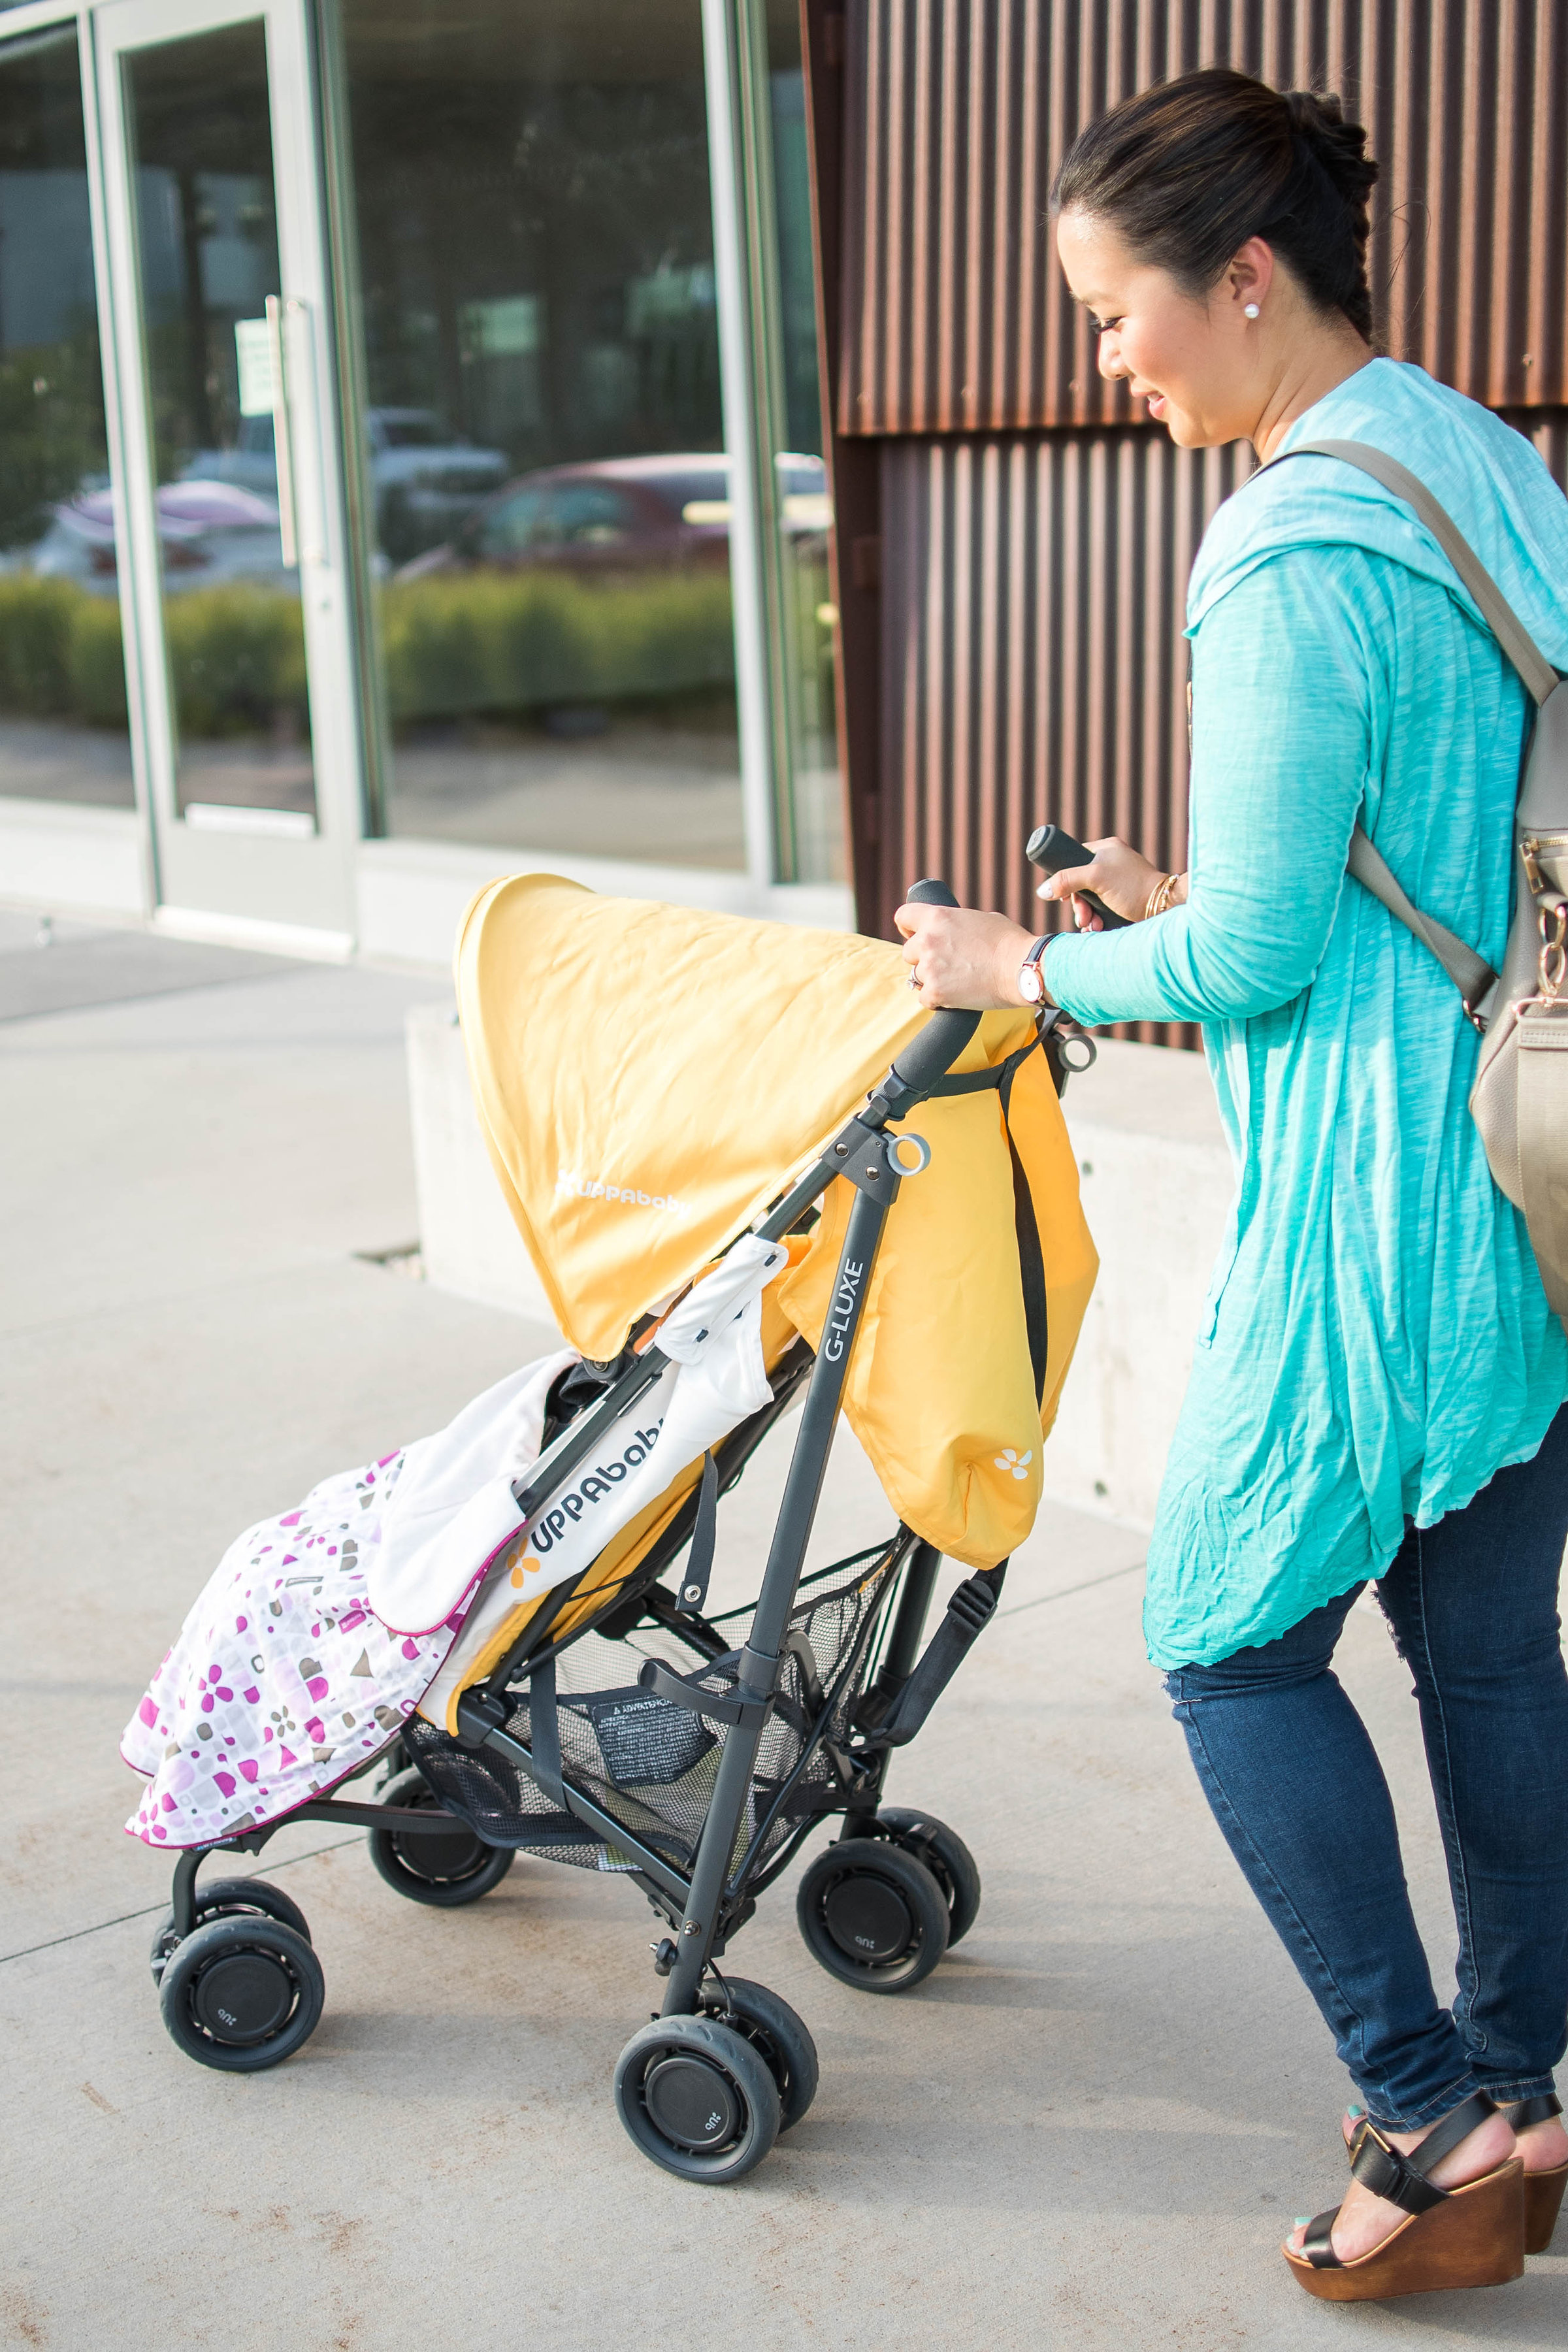 Traveling stroller